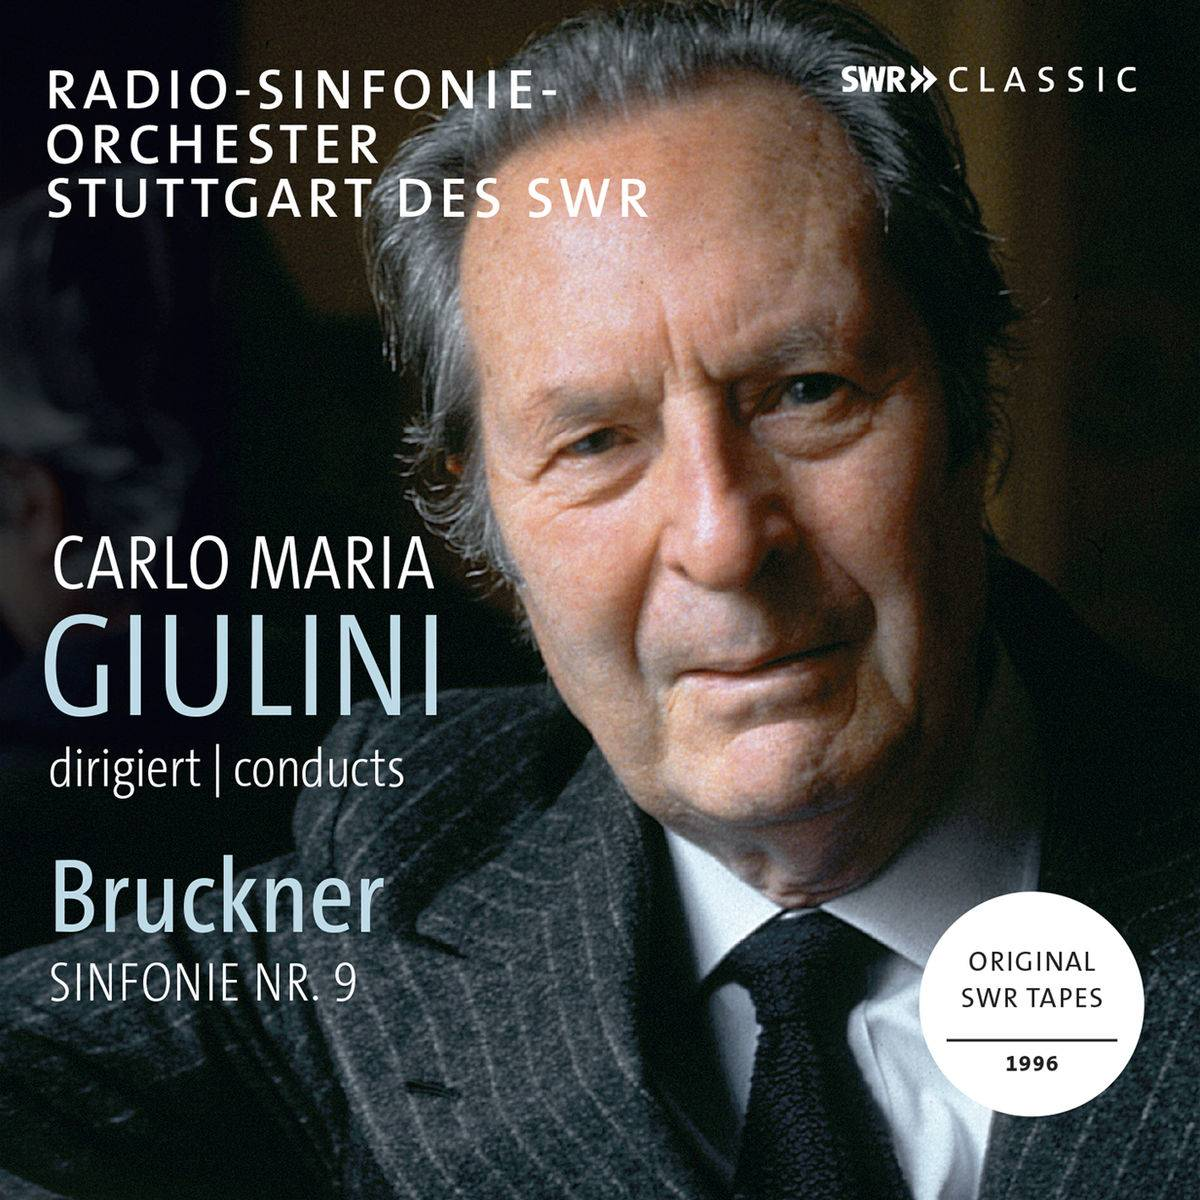 Carlo Maria Giulini & Radio-Sinfonieorchester Stuttgart des SWR - Bruckner: Symphony No. 9 (2018)